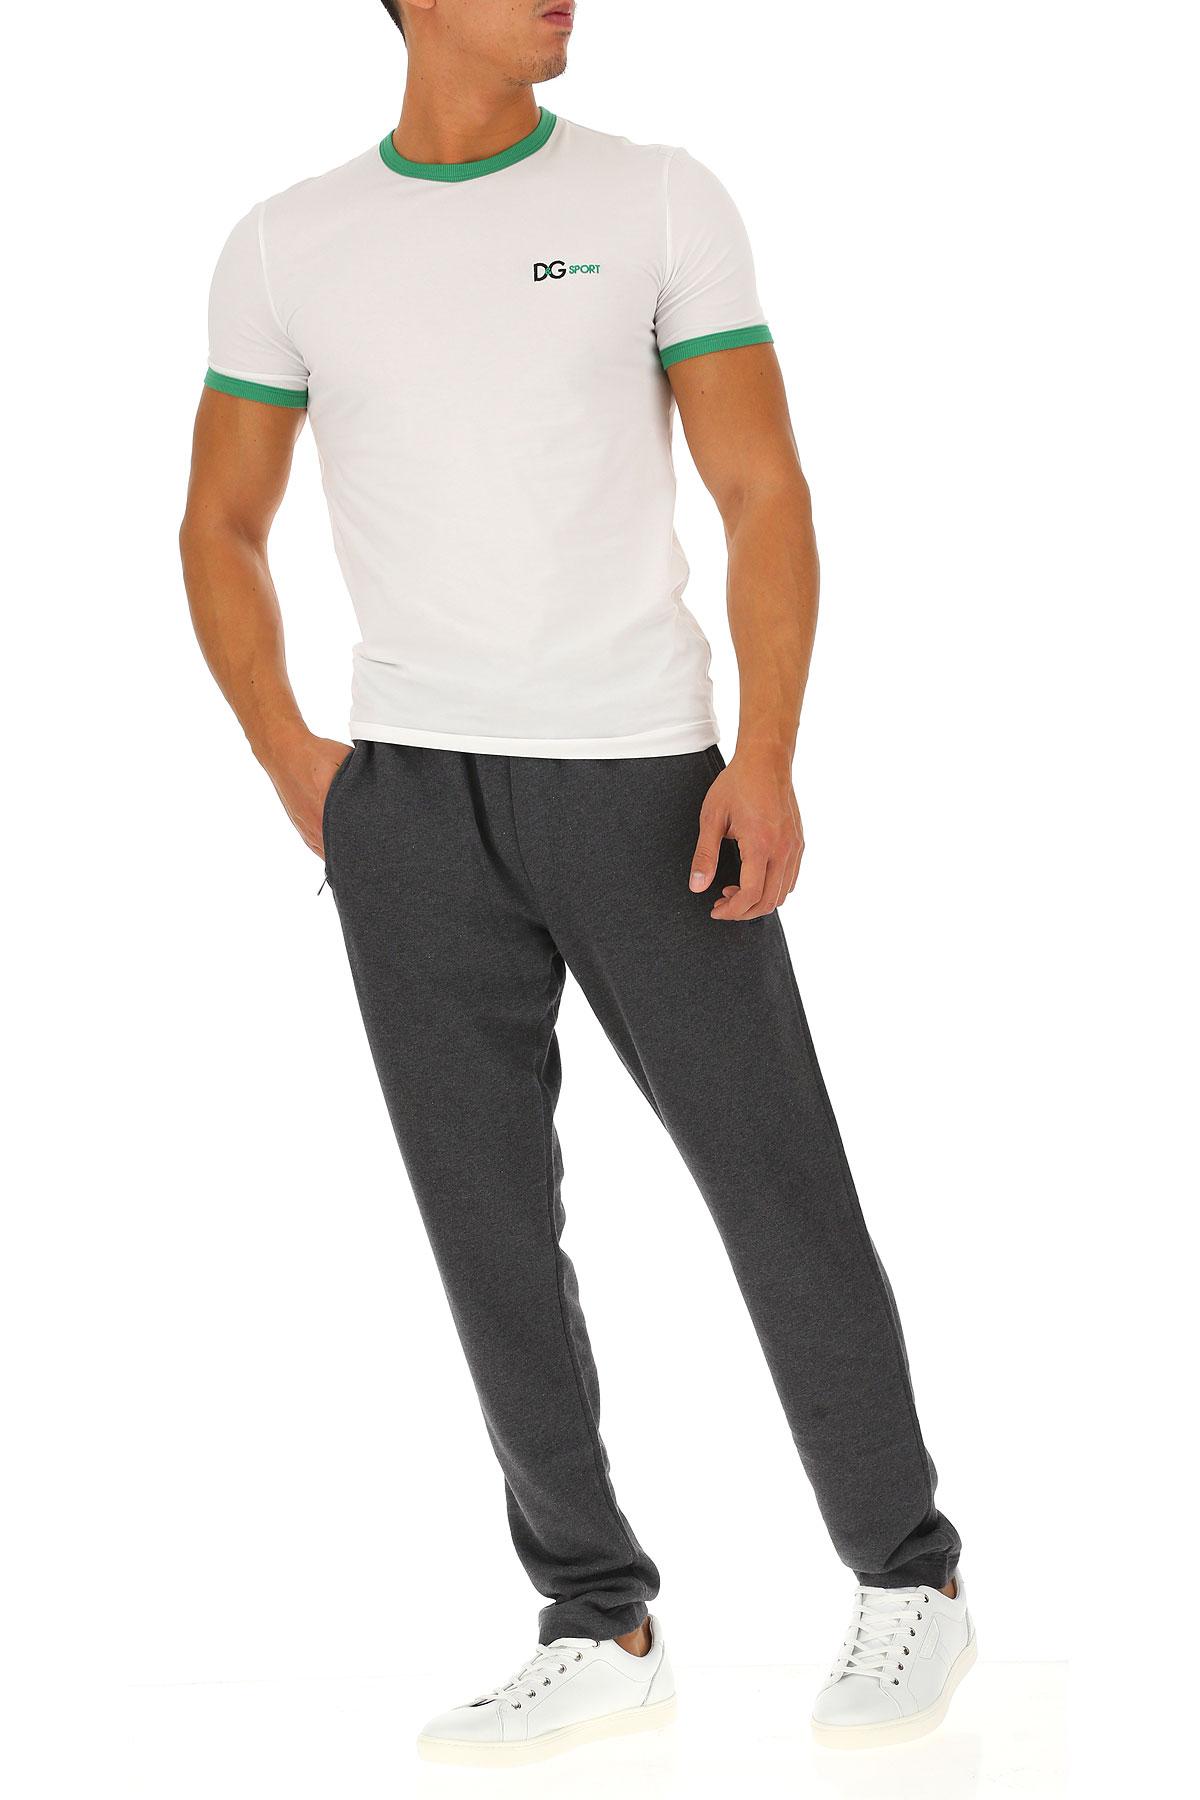 Dolce 2019 Para Gabbana Hombres Blanco verano Primavera Verde amp; Ropa n0Urq5w0P